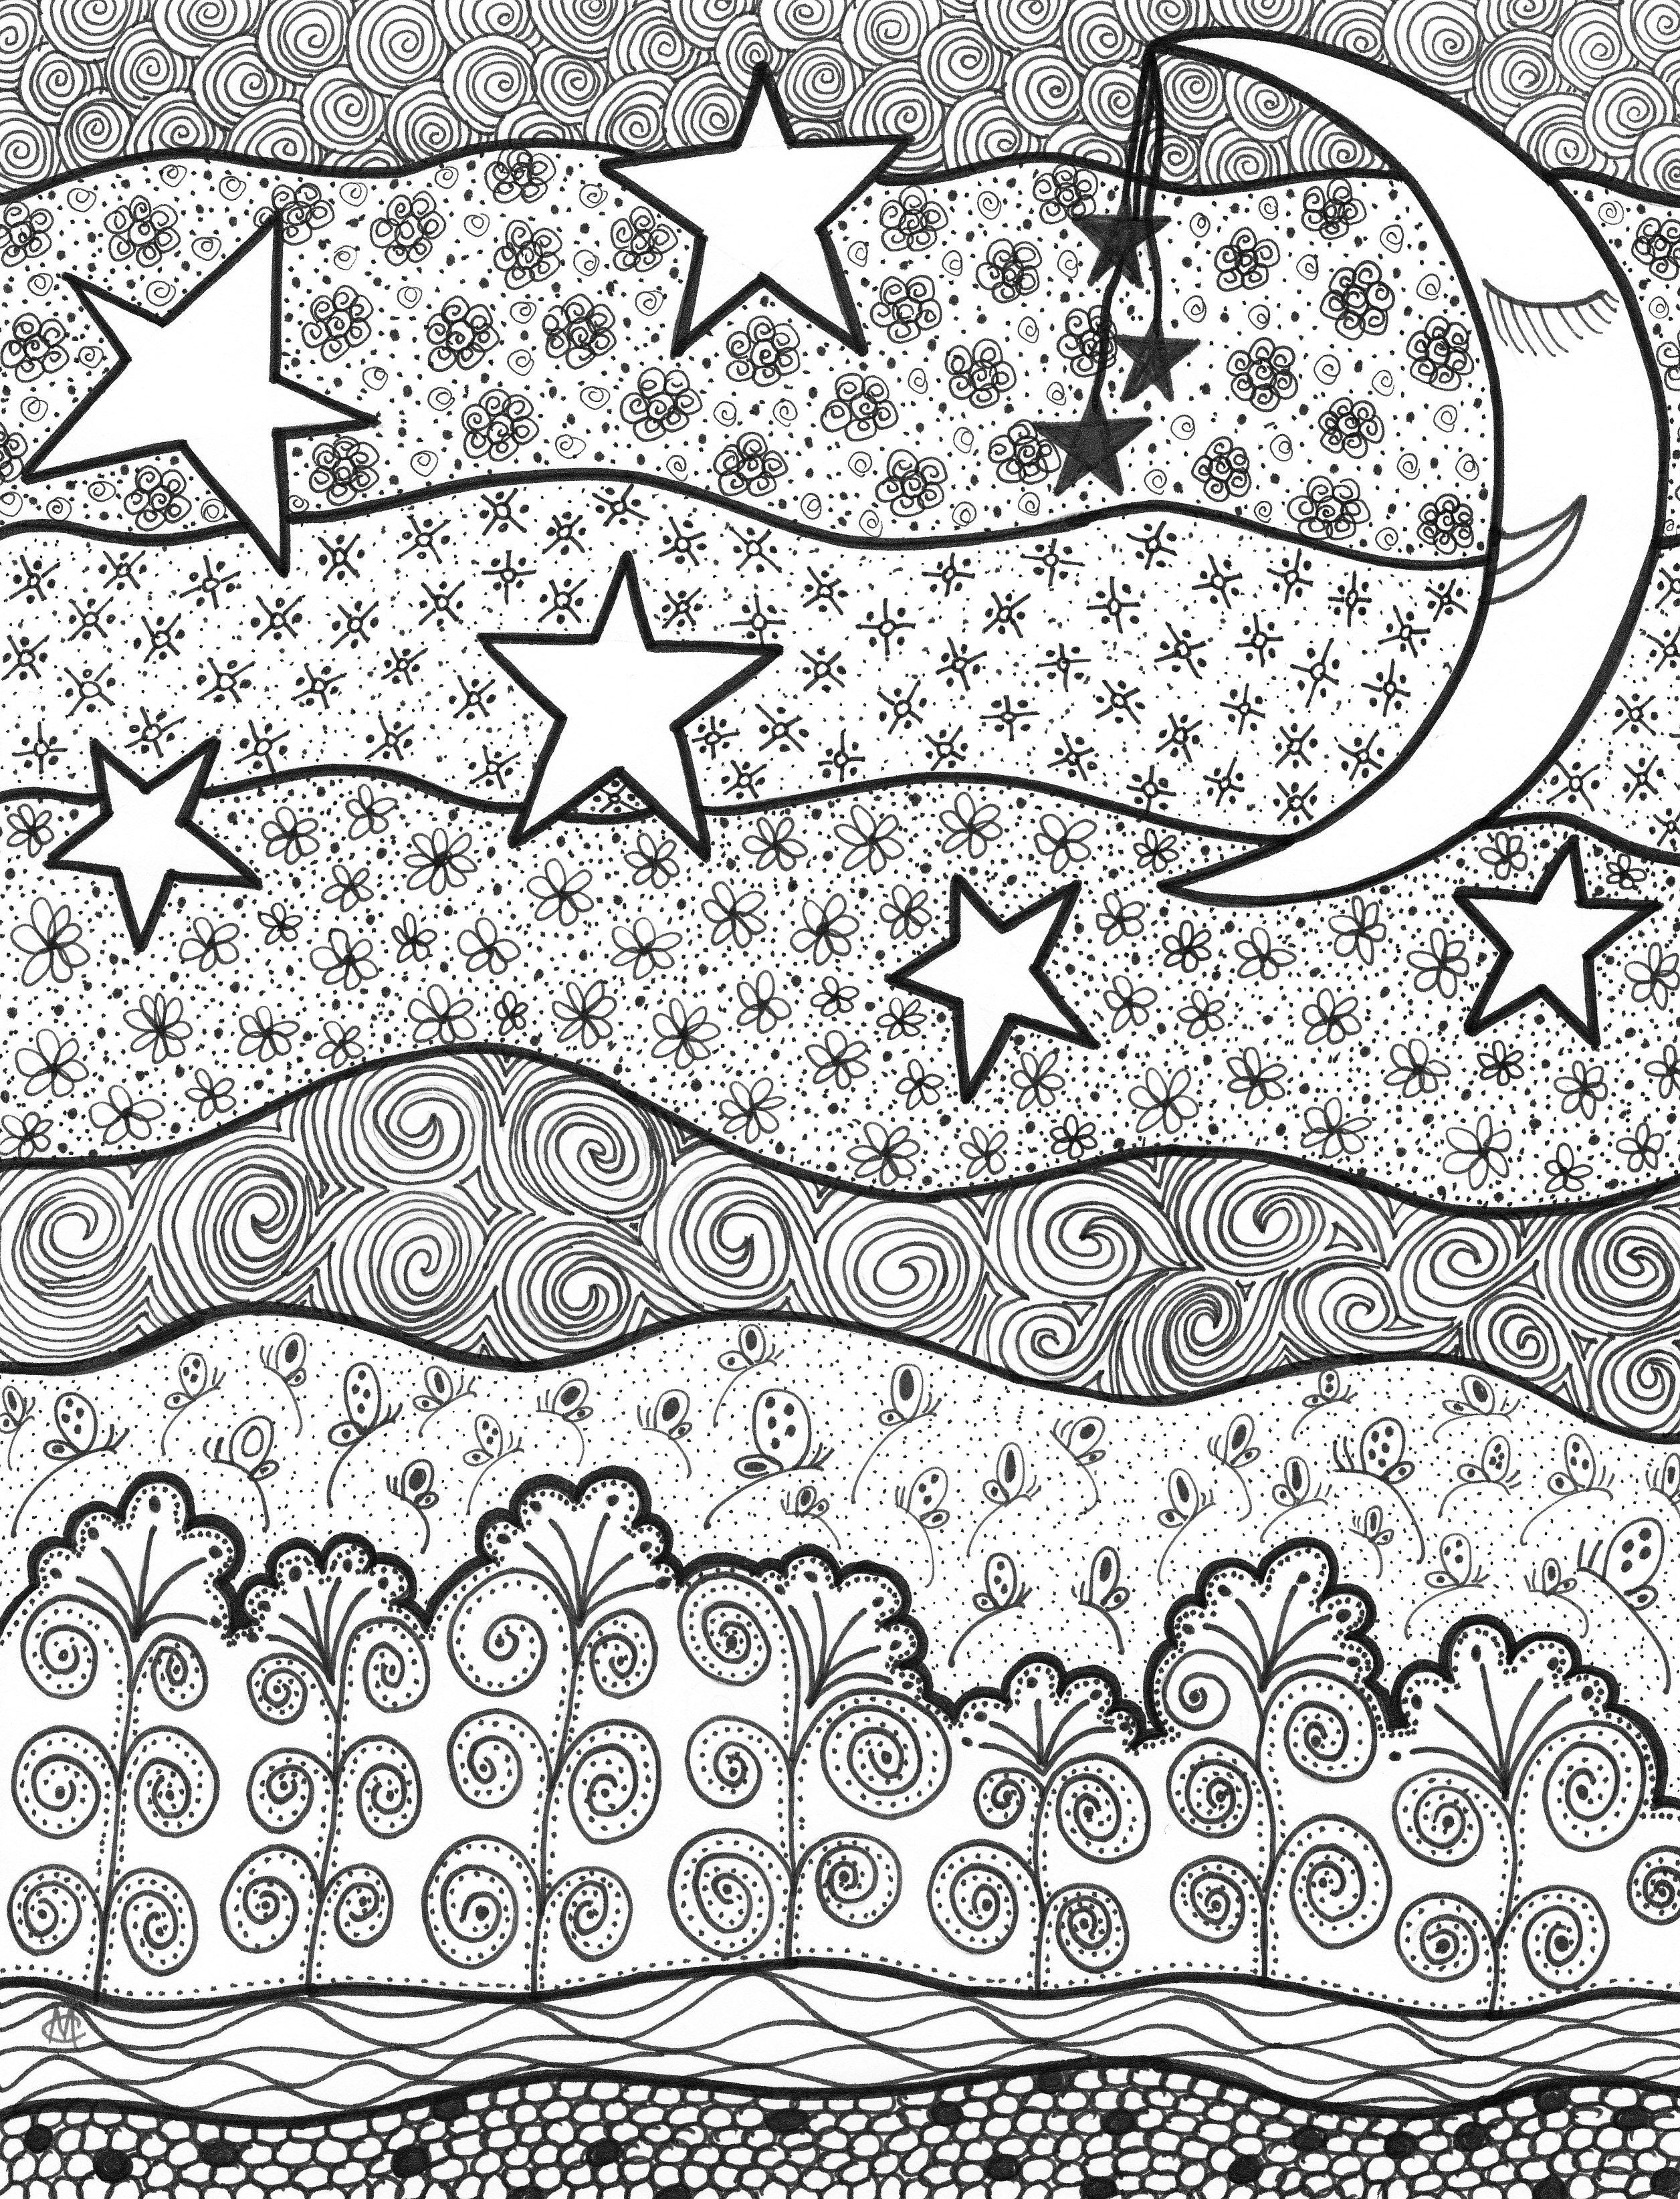 good night   diseño   Pinterest   Mandalas, Estampados zentangle y ...